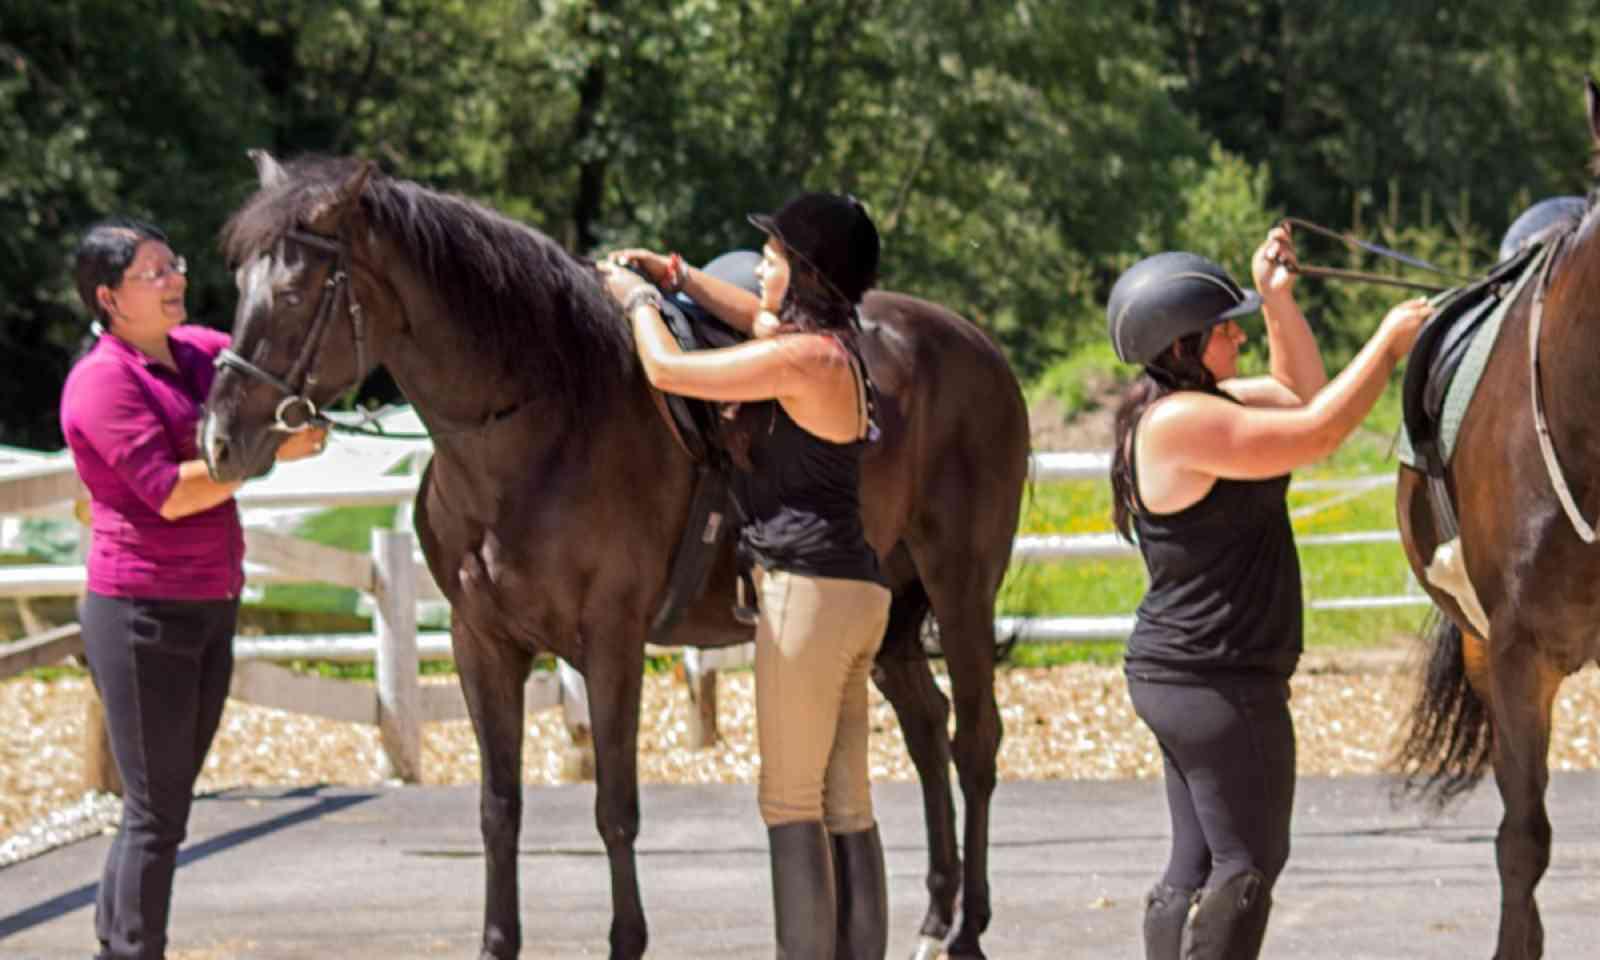 Horses at Trattlerhof (trattlerhof.at)